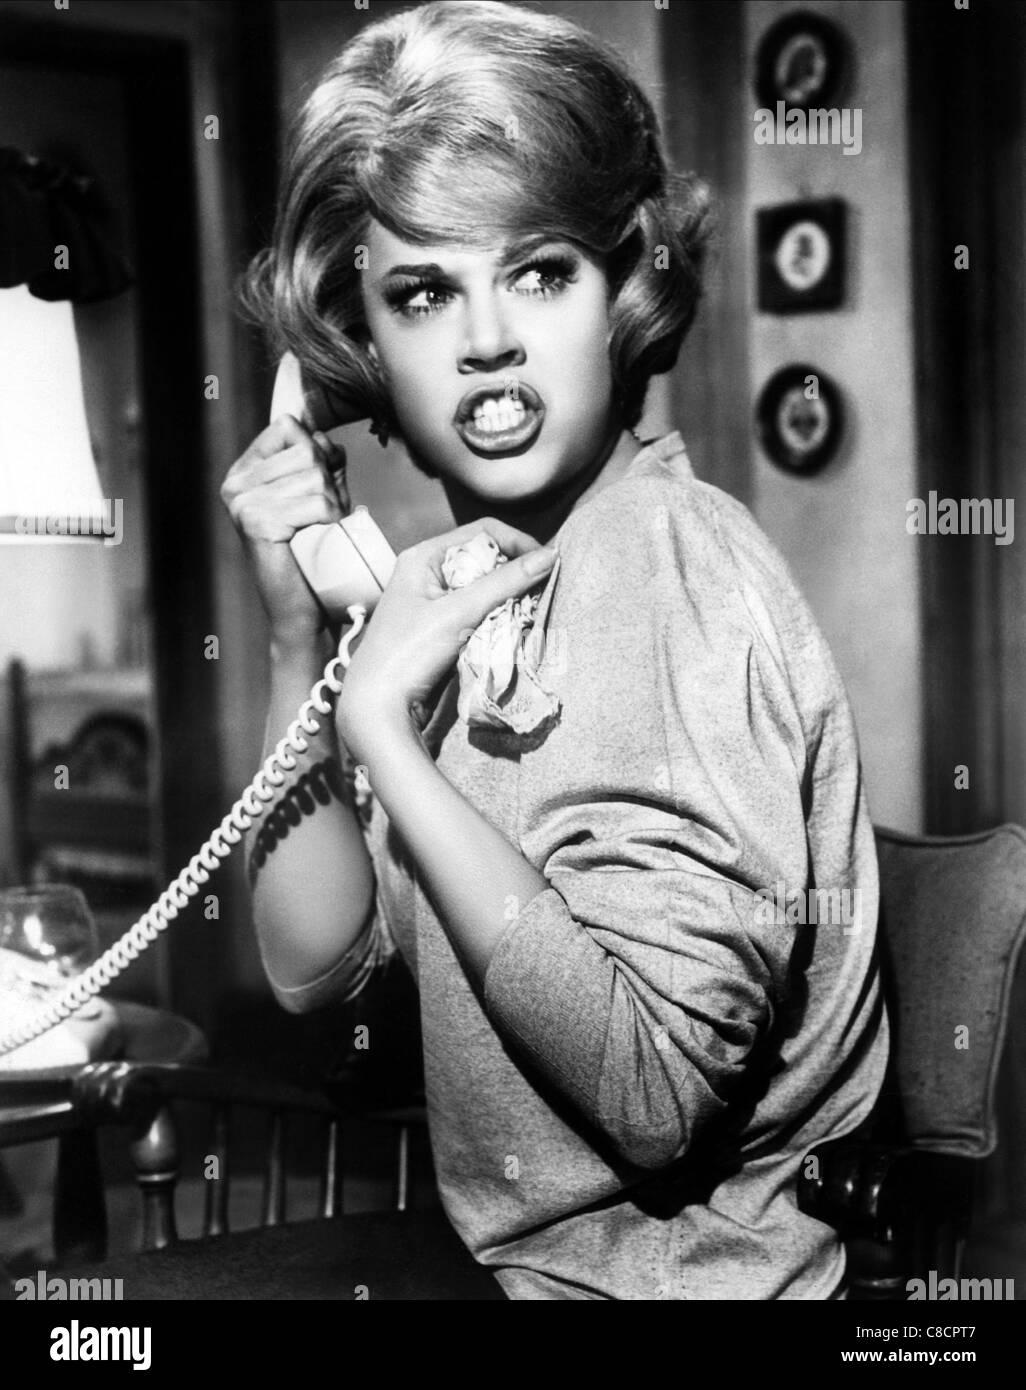 JANE FONDA PERIOD OF ADJUSTMENT (1962) - Stock Image